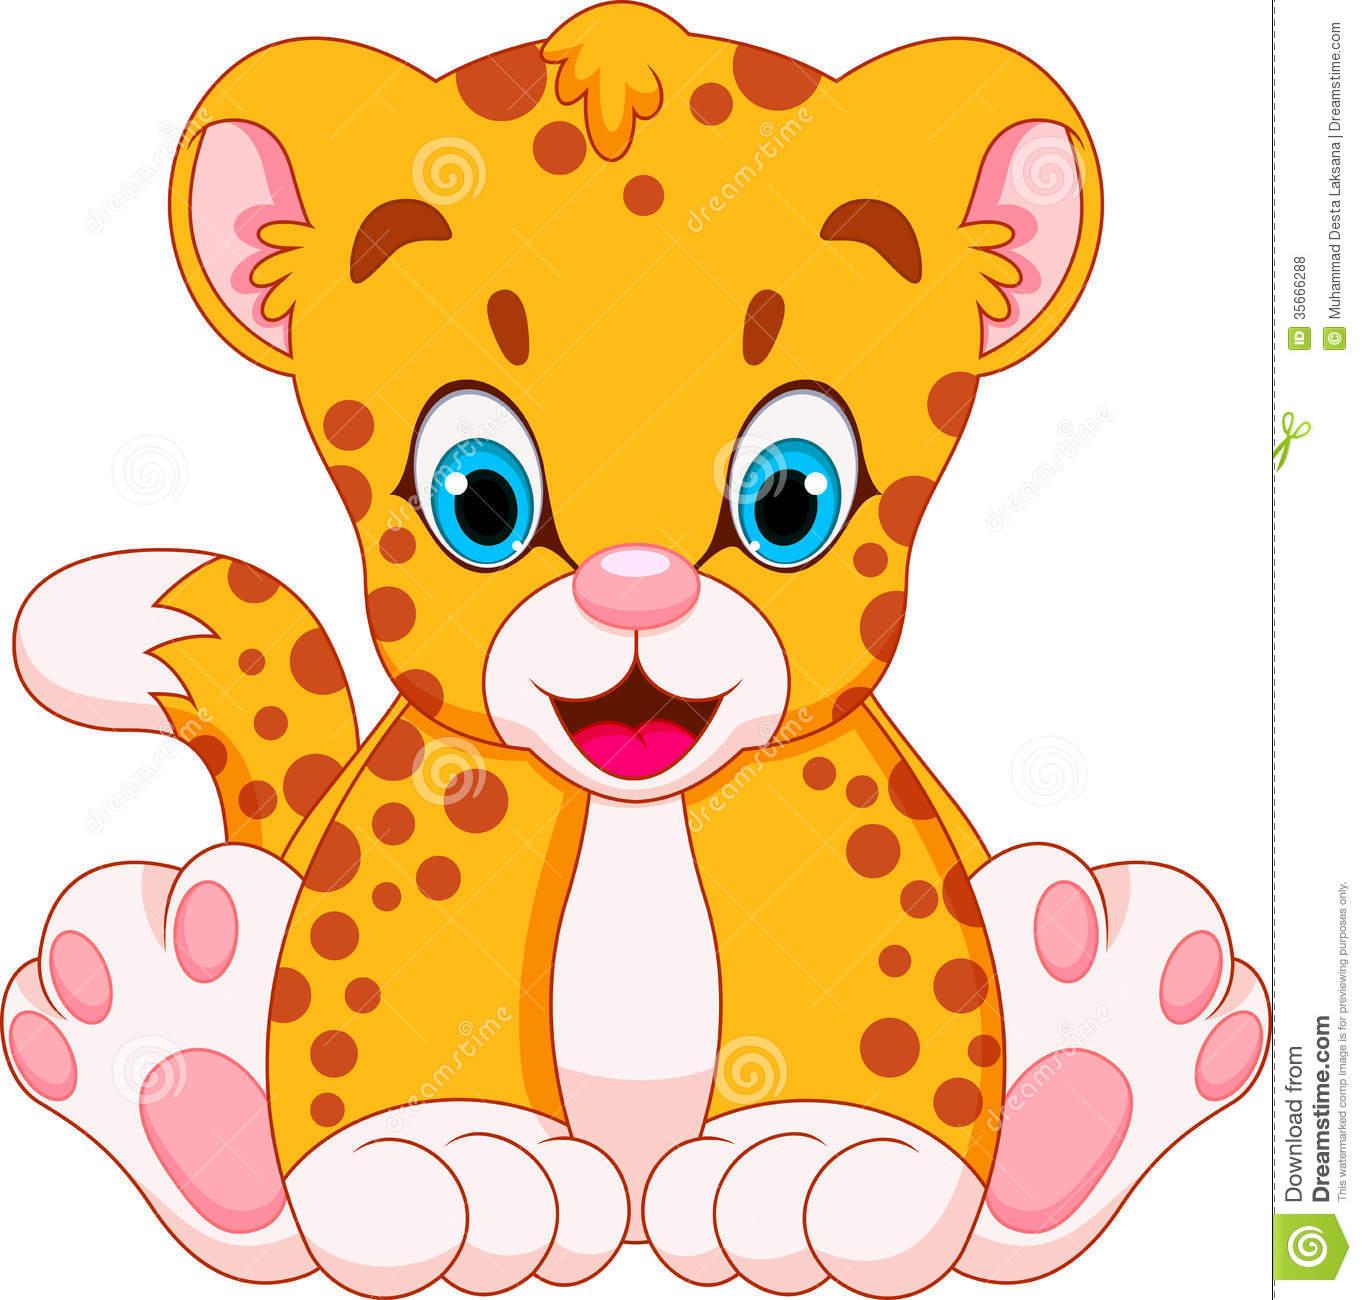 baby%20cheetah%20clipart